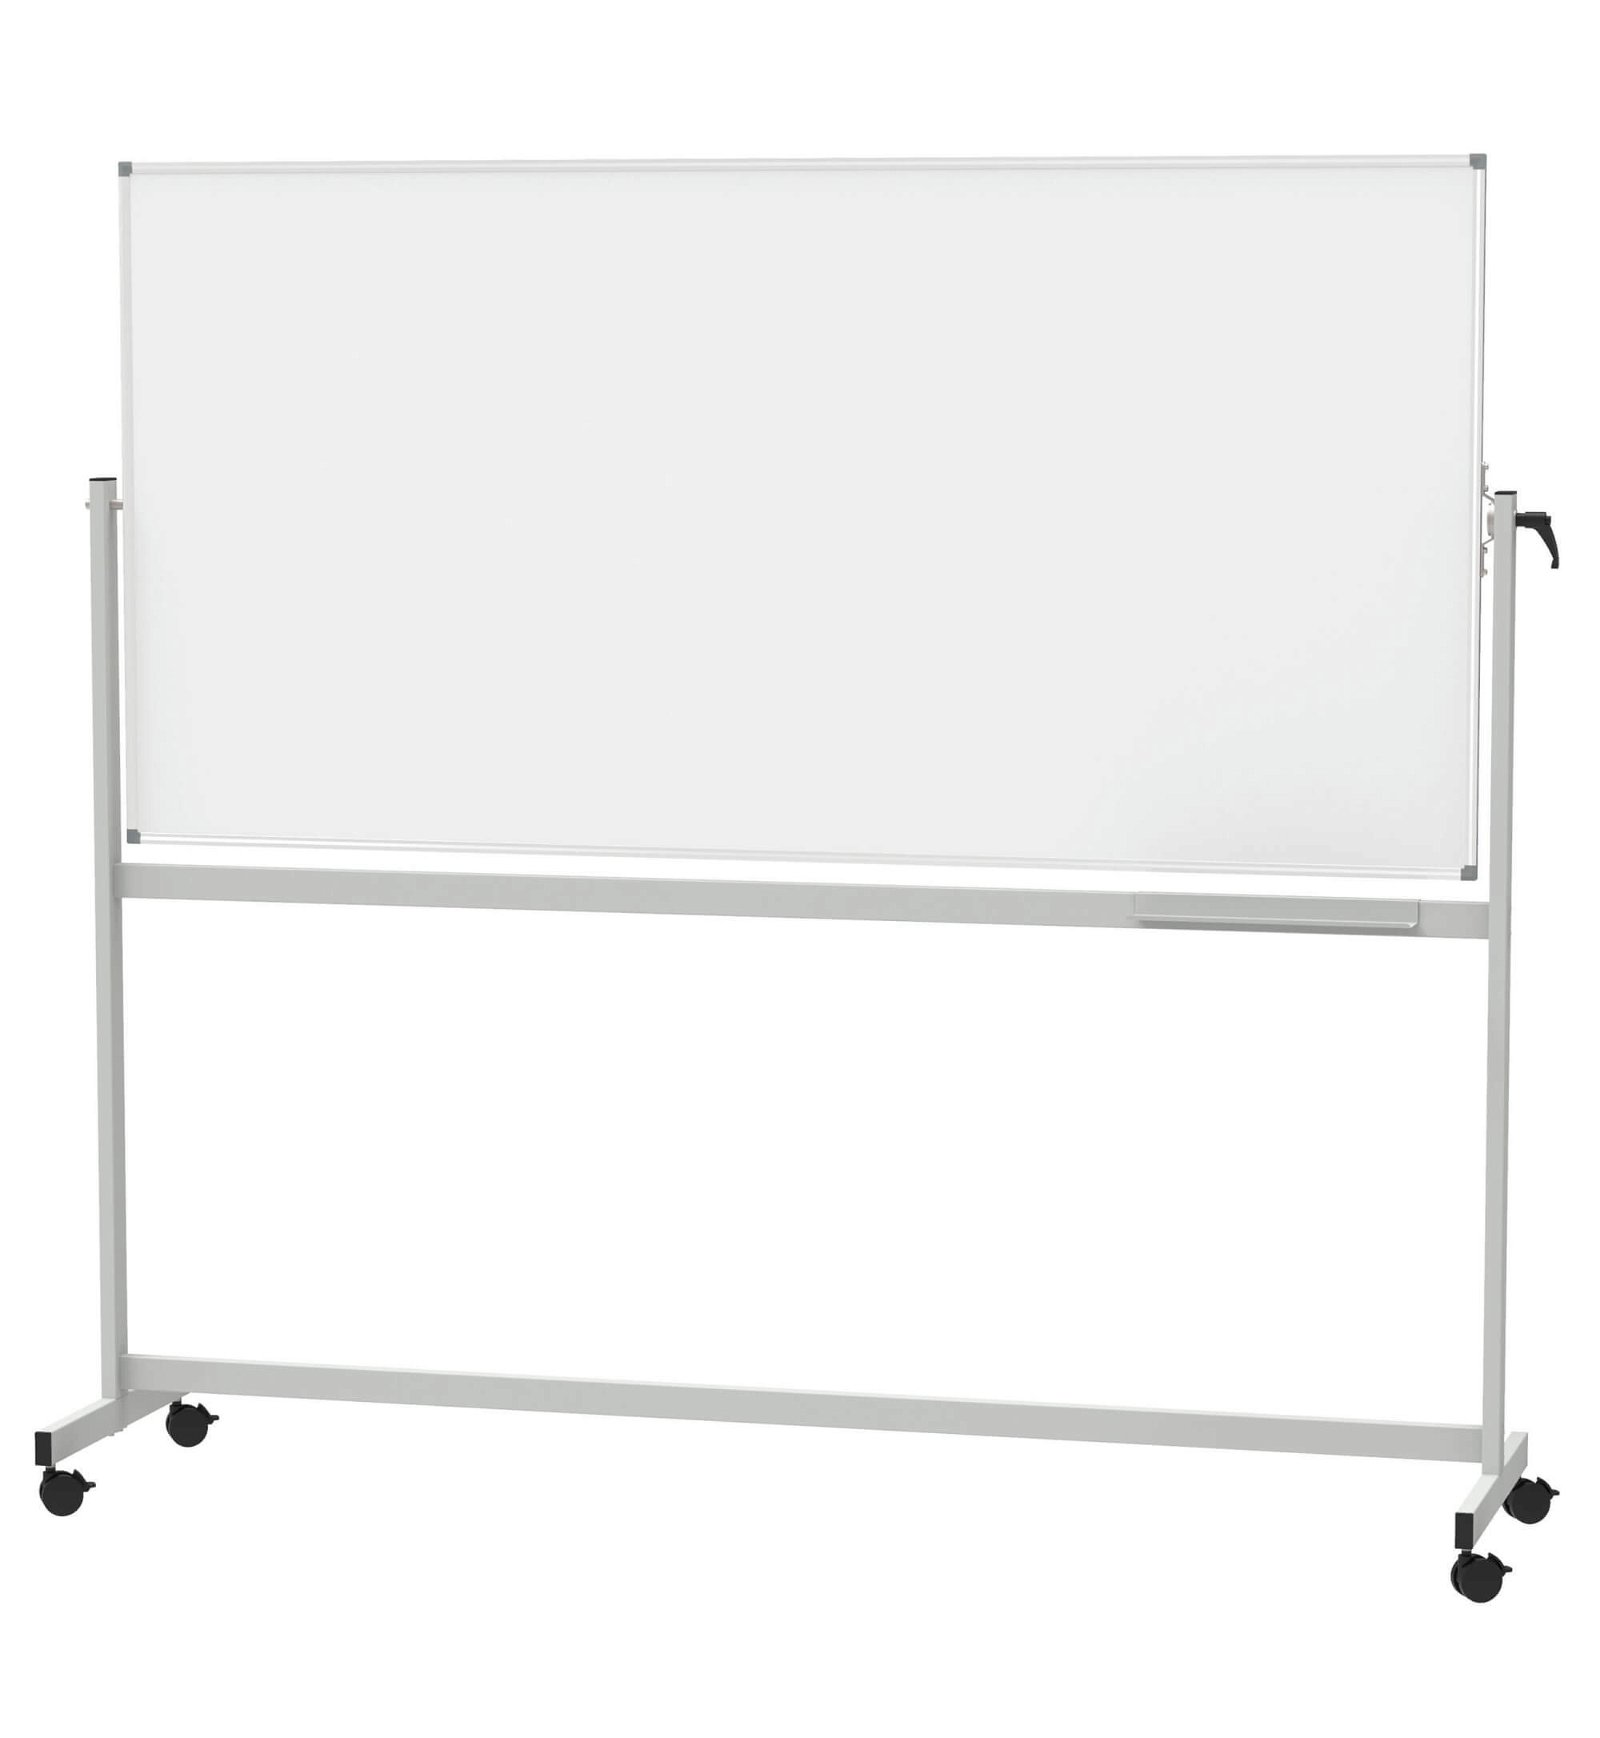 Mobiles Whiteb. MAULstandard, drehbar, Emaille, 100x200 cm, grau